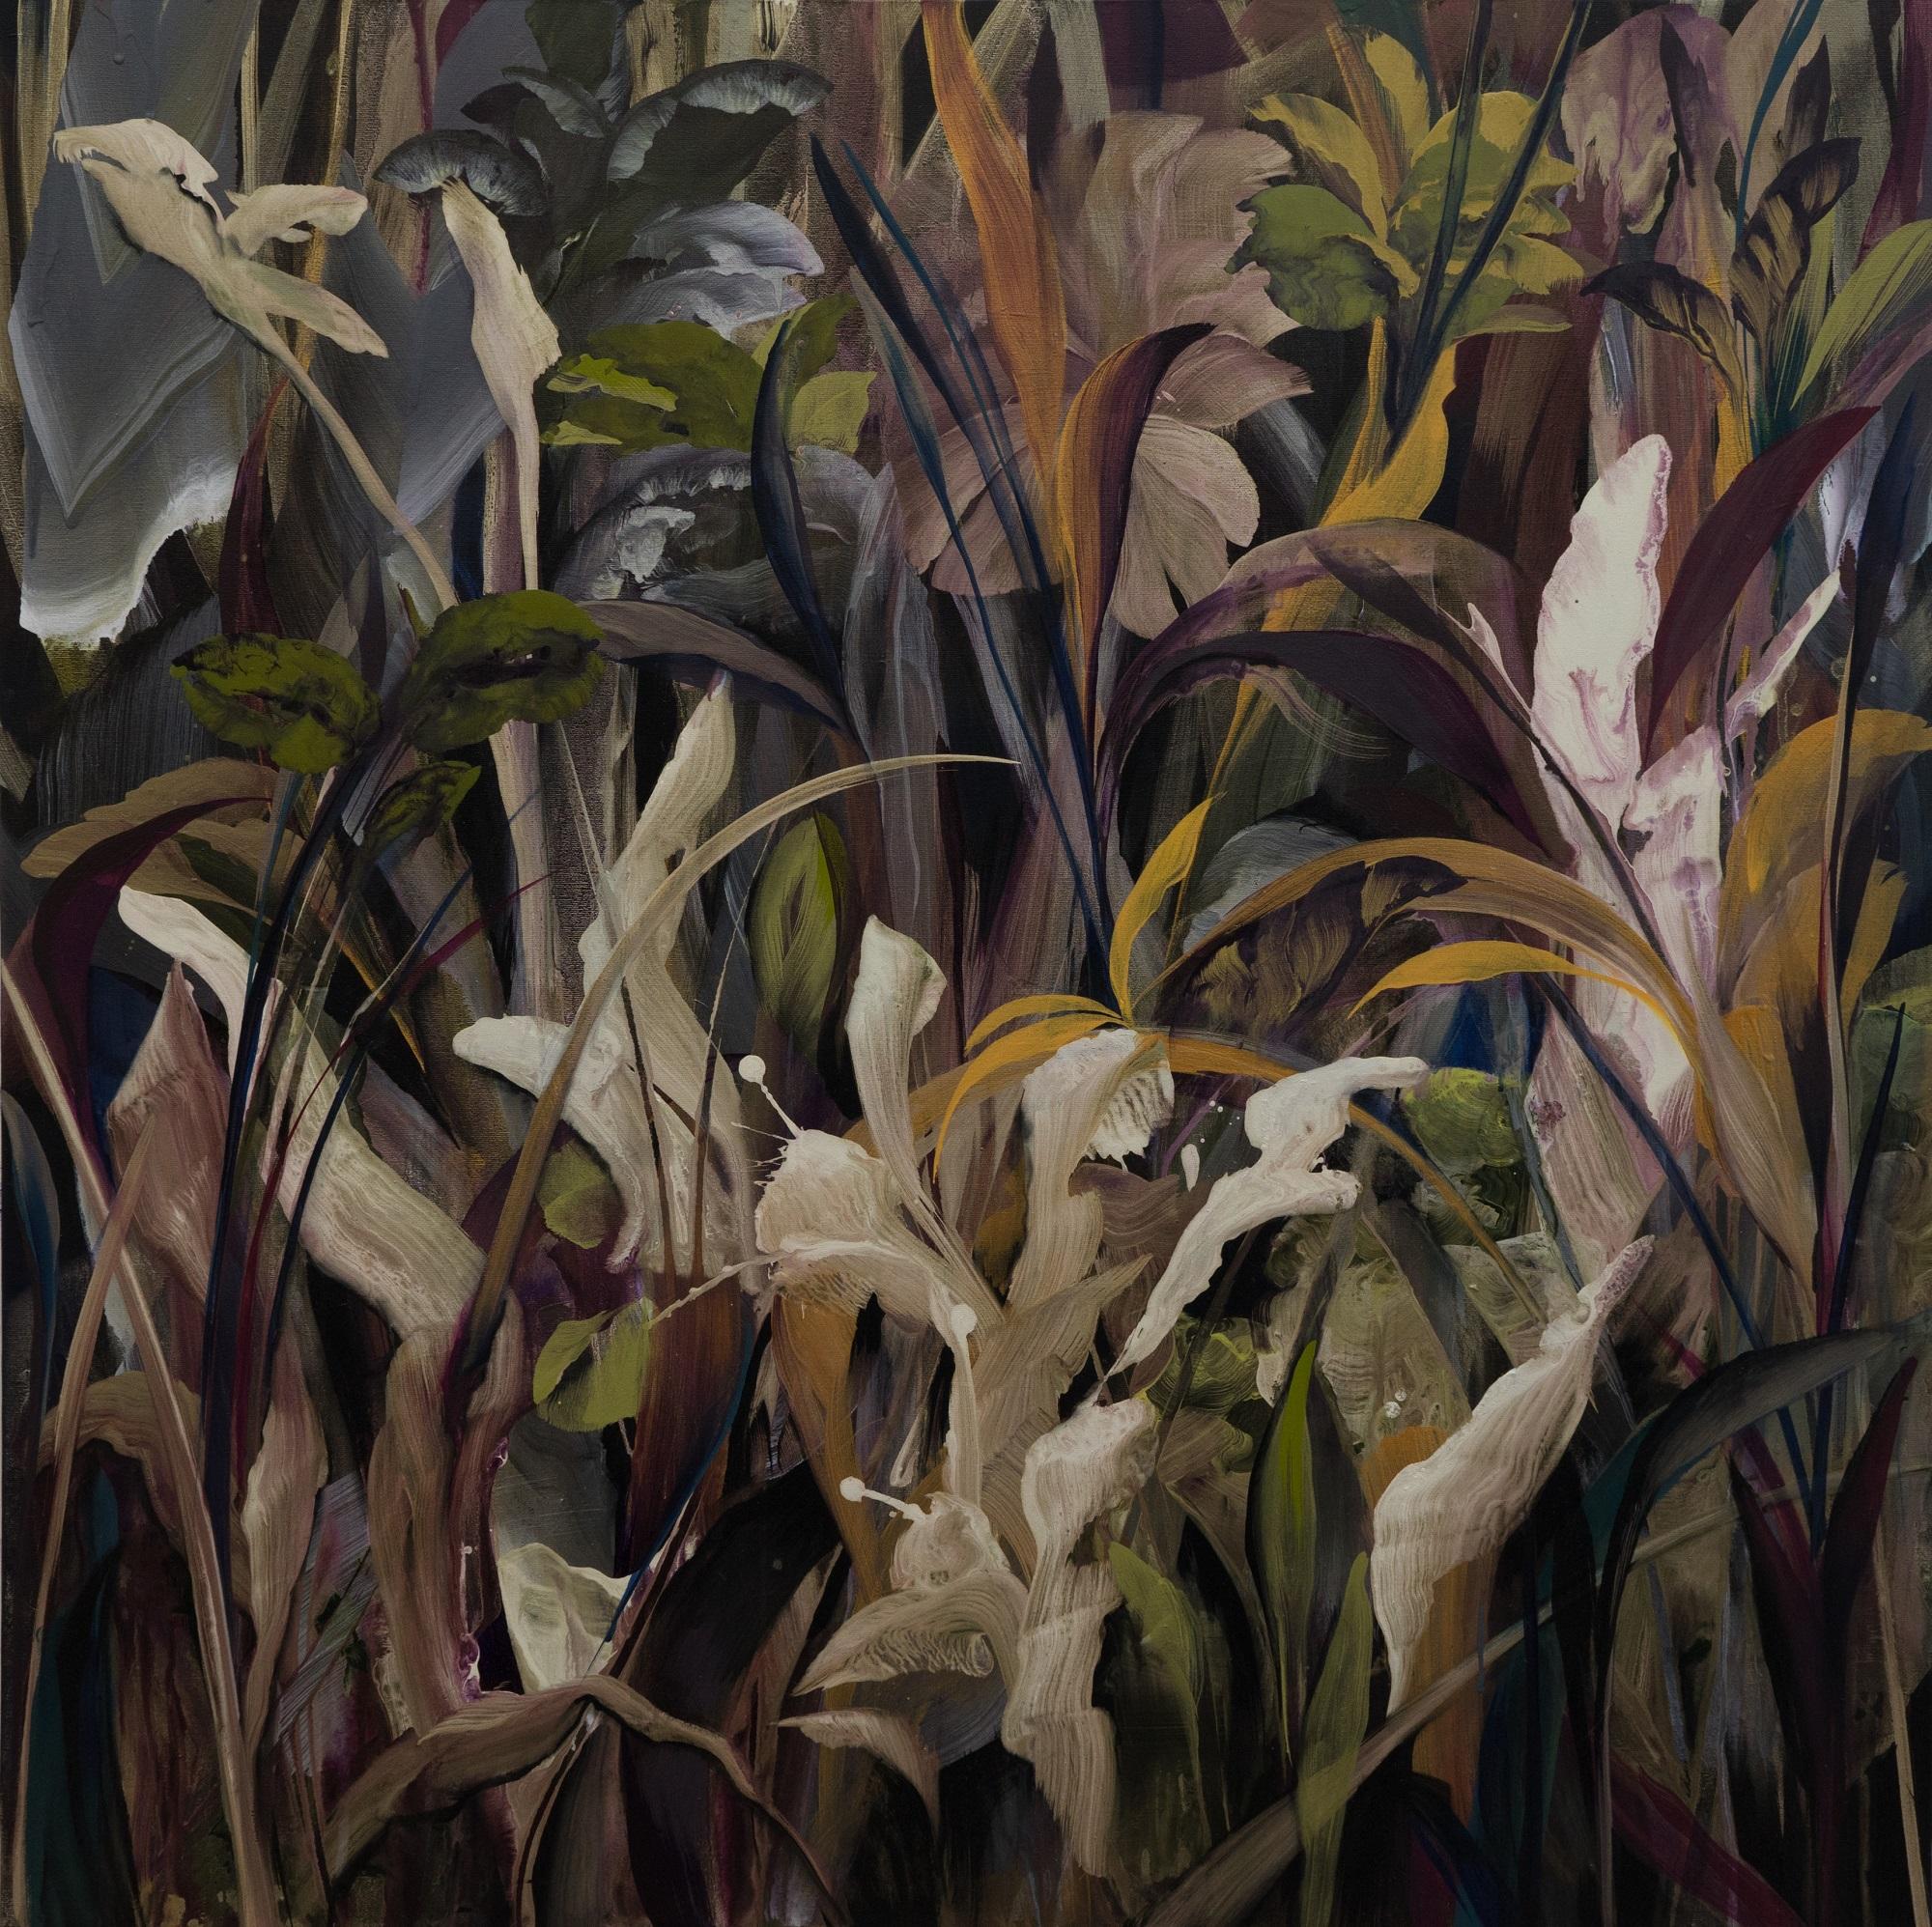 'Passing' Orlanda Broom Acrylic on canvas, 100cm x 100cm , 2017